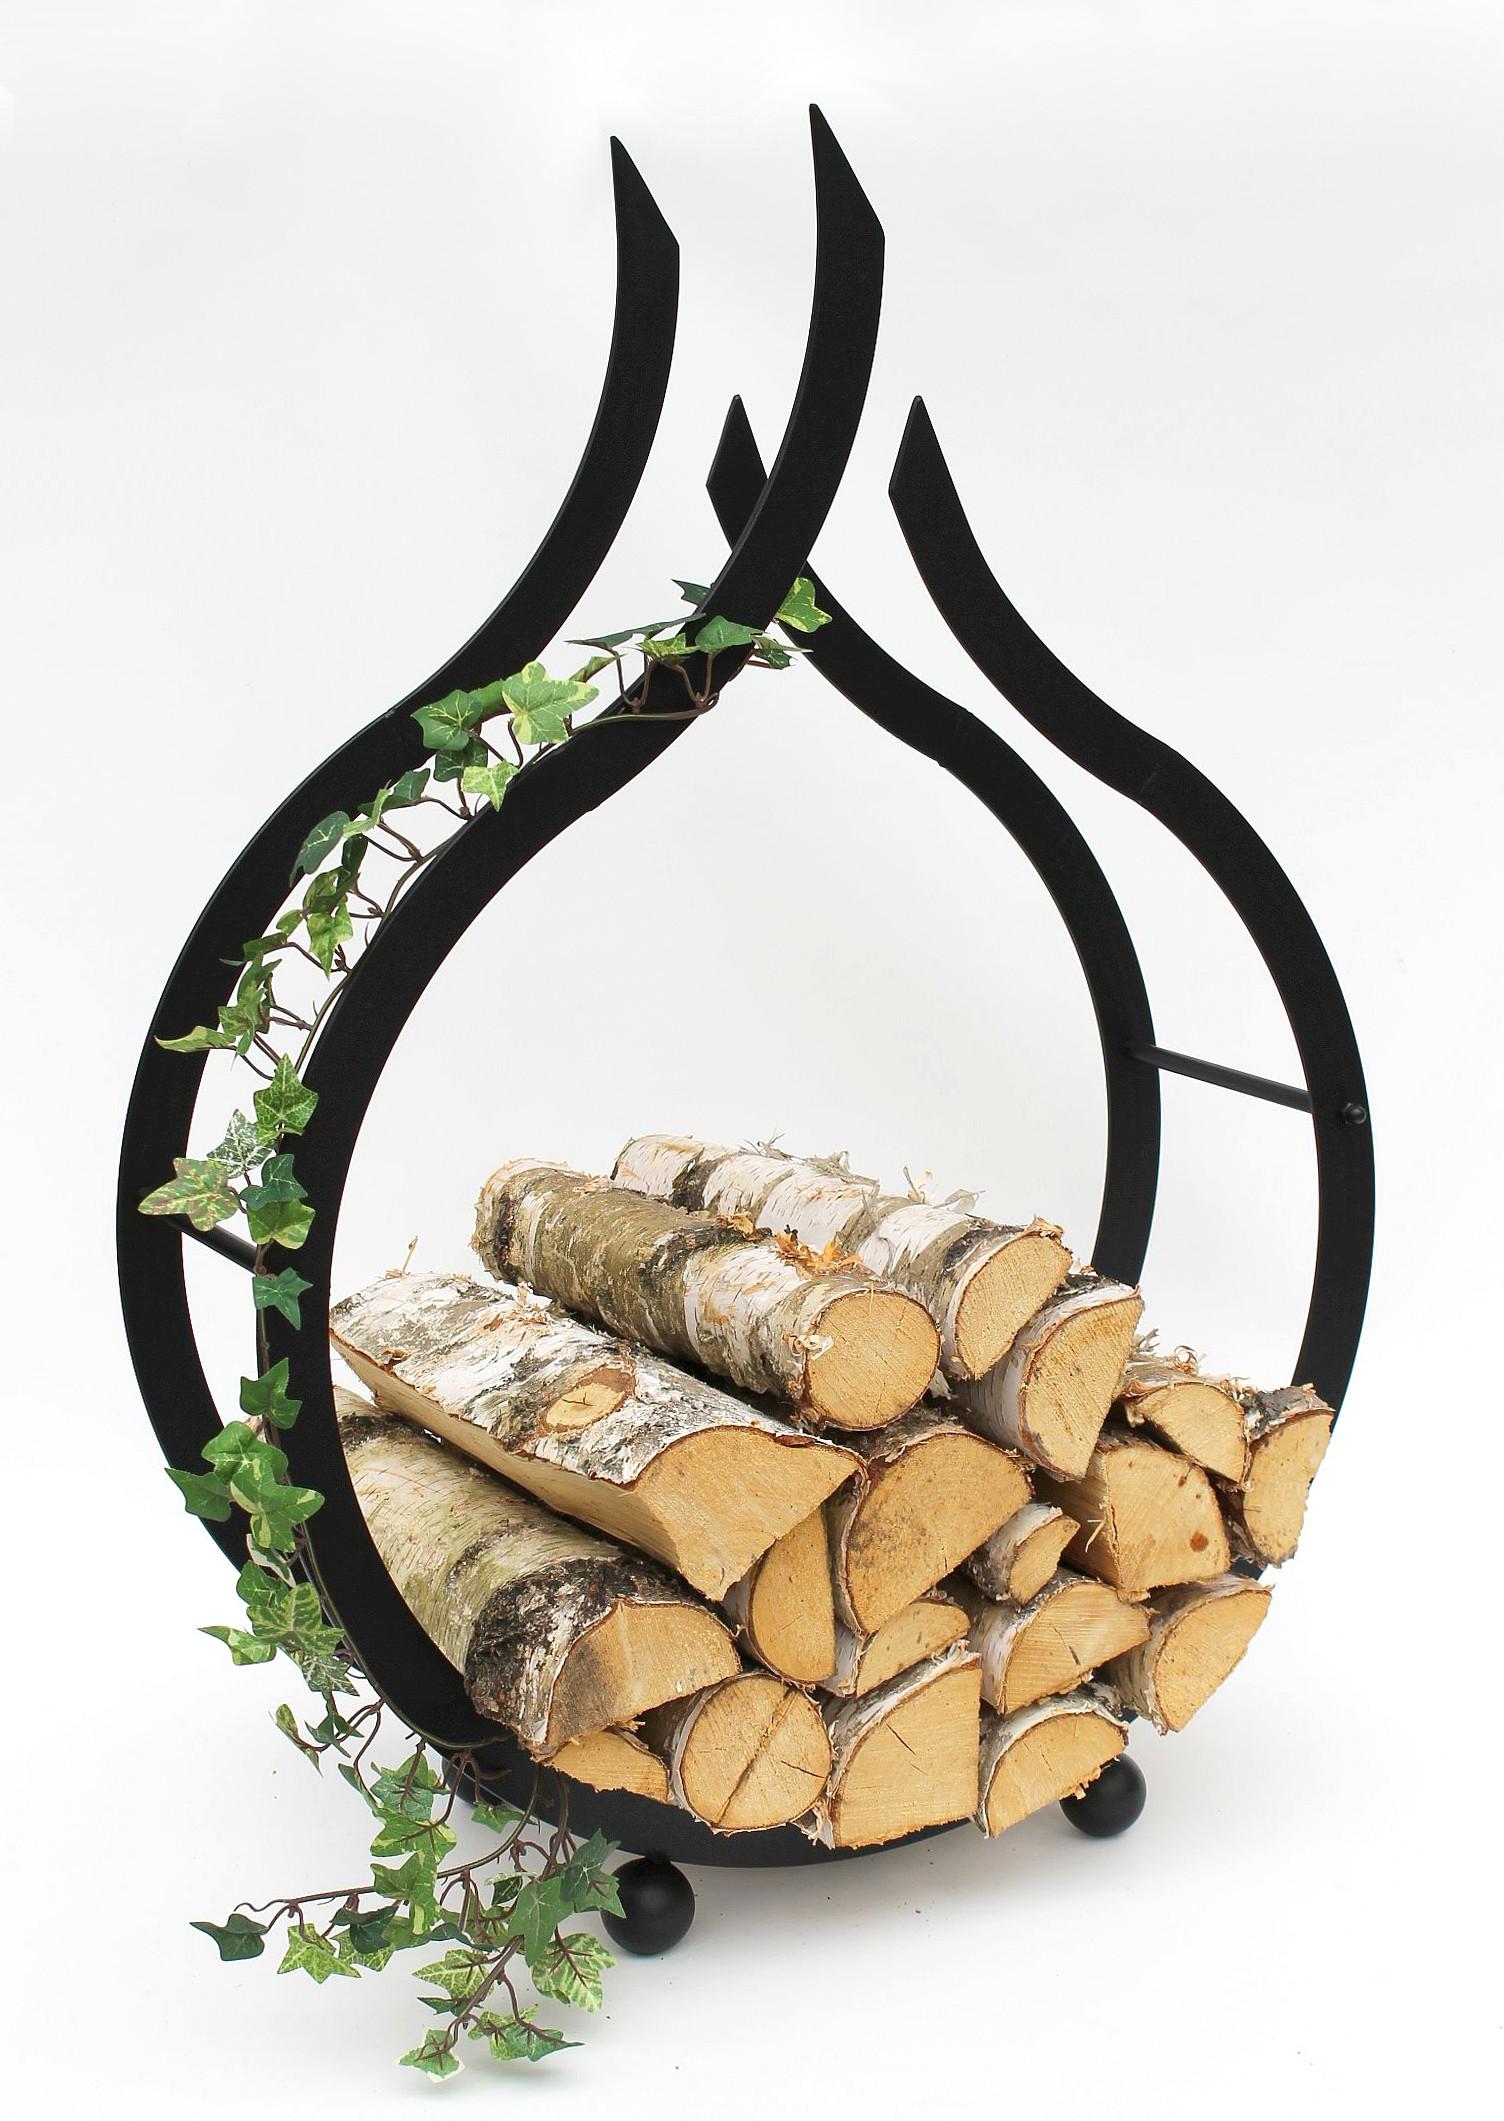 Wood Rack Flame Chimney Stand 78 Cm Wooden Basket Firewood